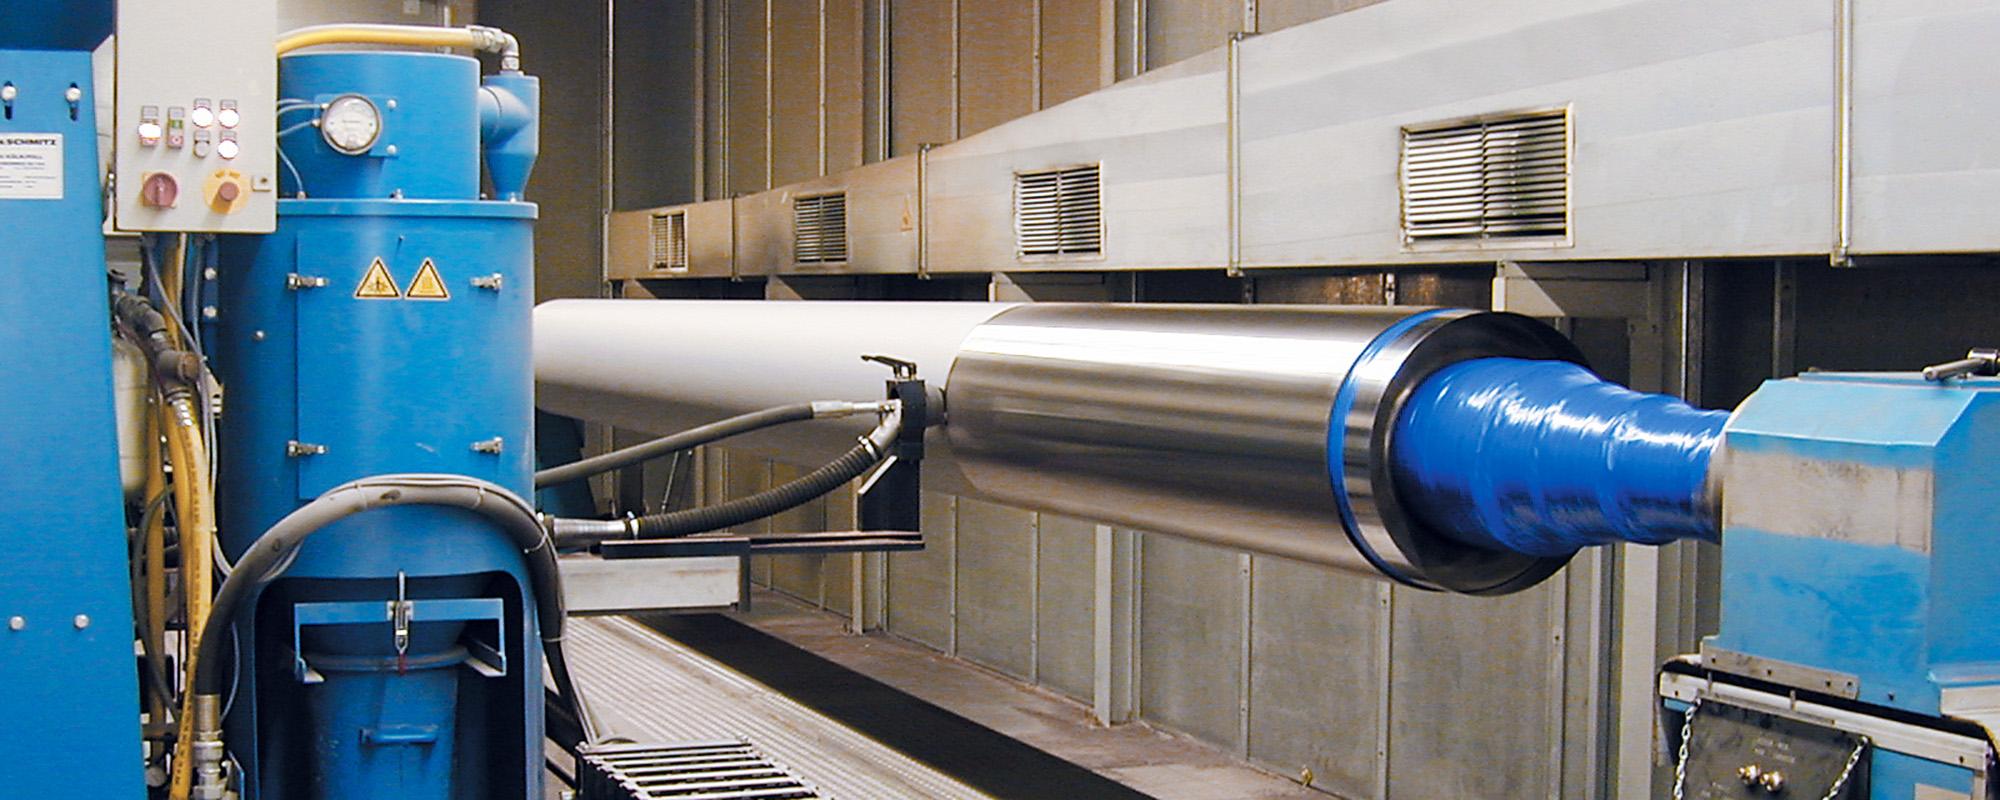 Cylinder Blasting